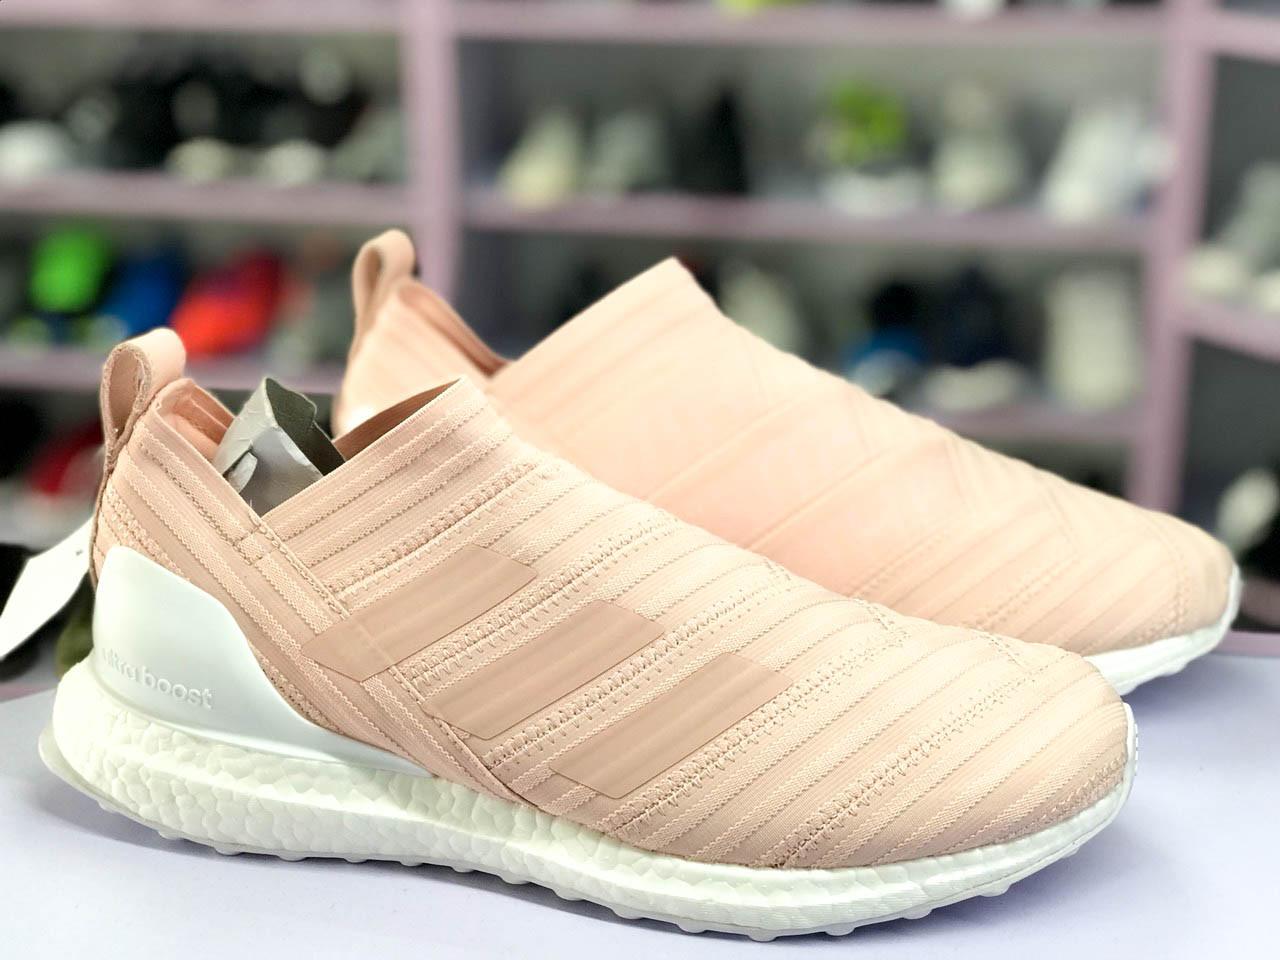 4cd772a5d3fa Кроссовки Adidas K Nemeziz 17.1 UltraBOOST